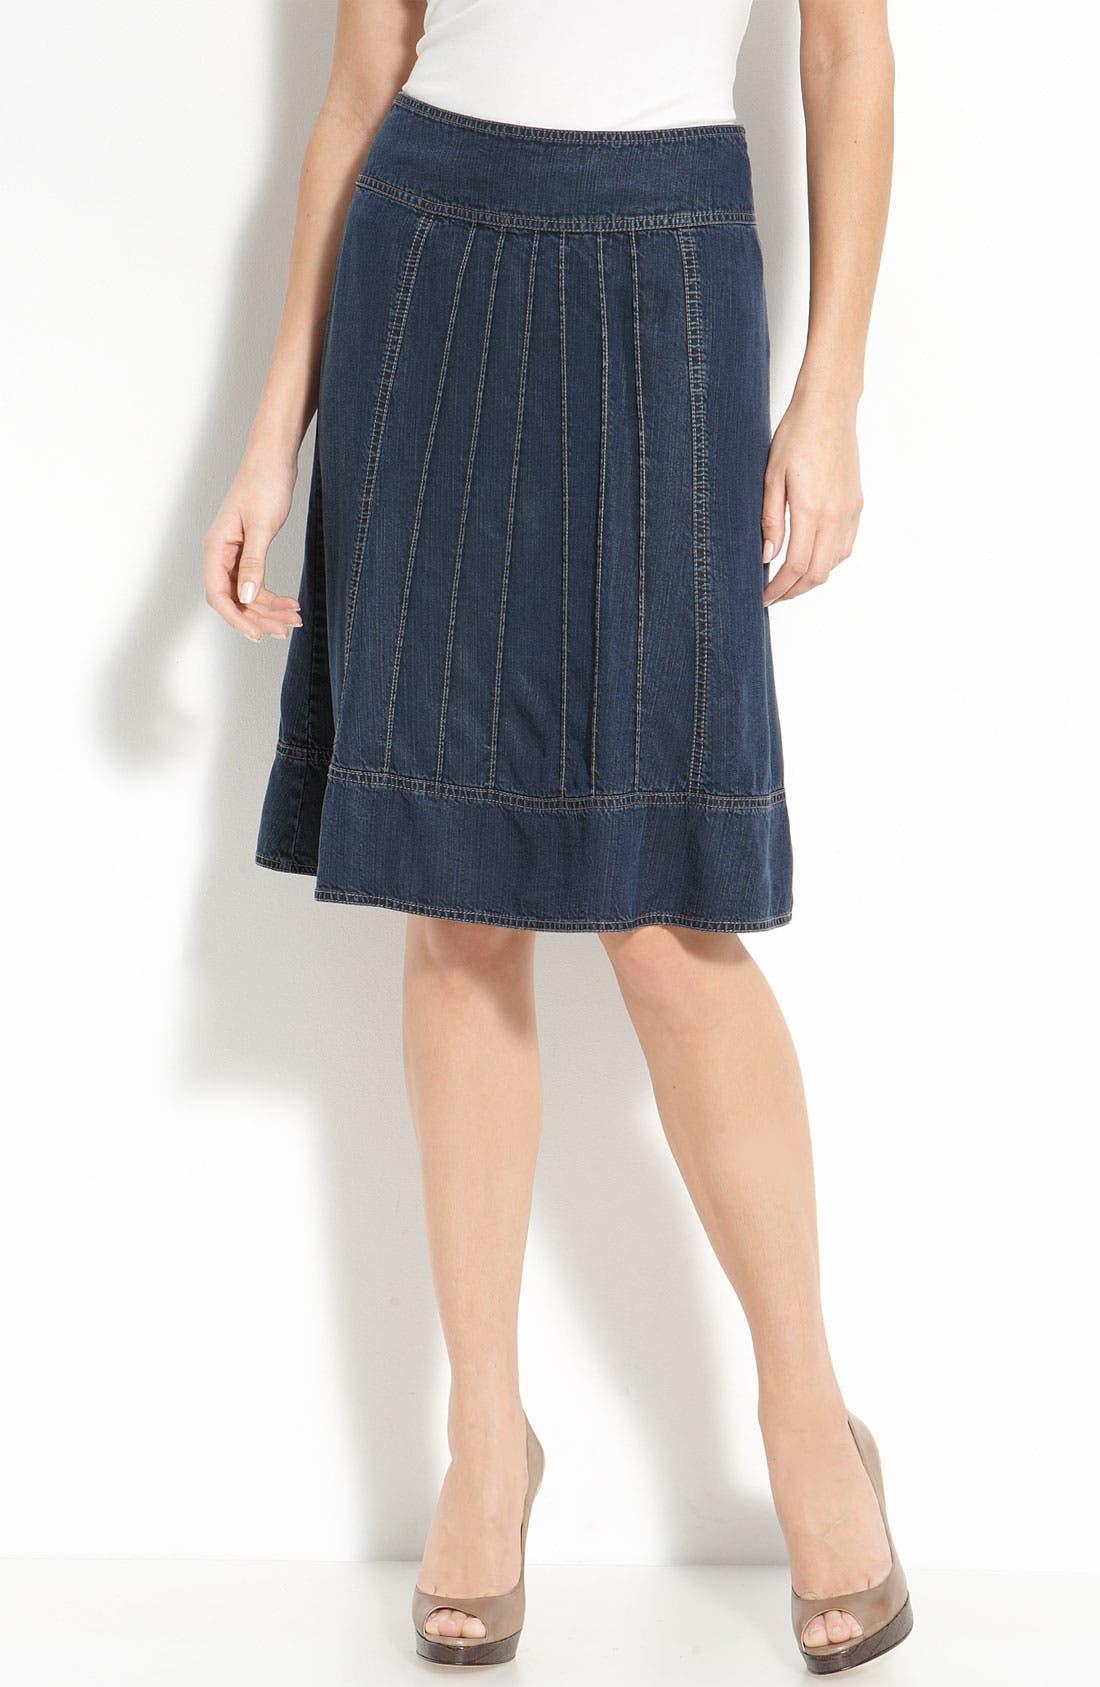 Alternate Image 1 Selected - Nic + Zoe Pintuck Pleat Denim Skirt (Petite)